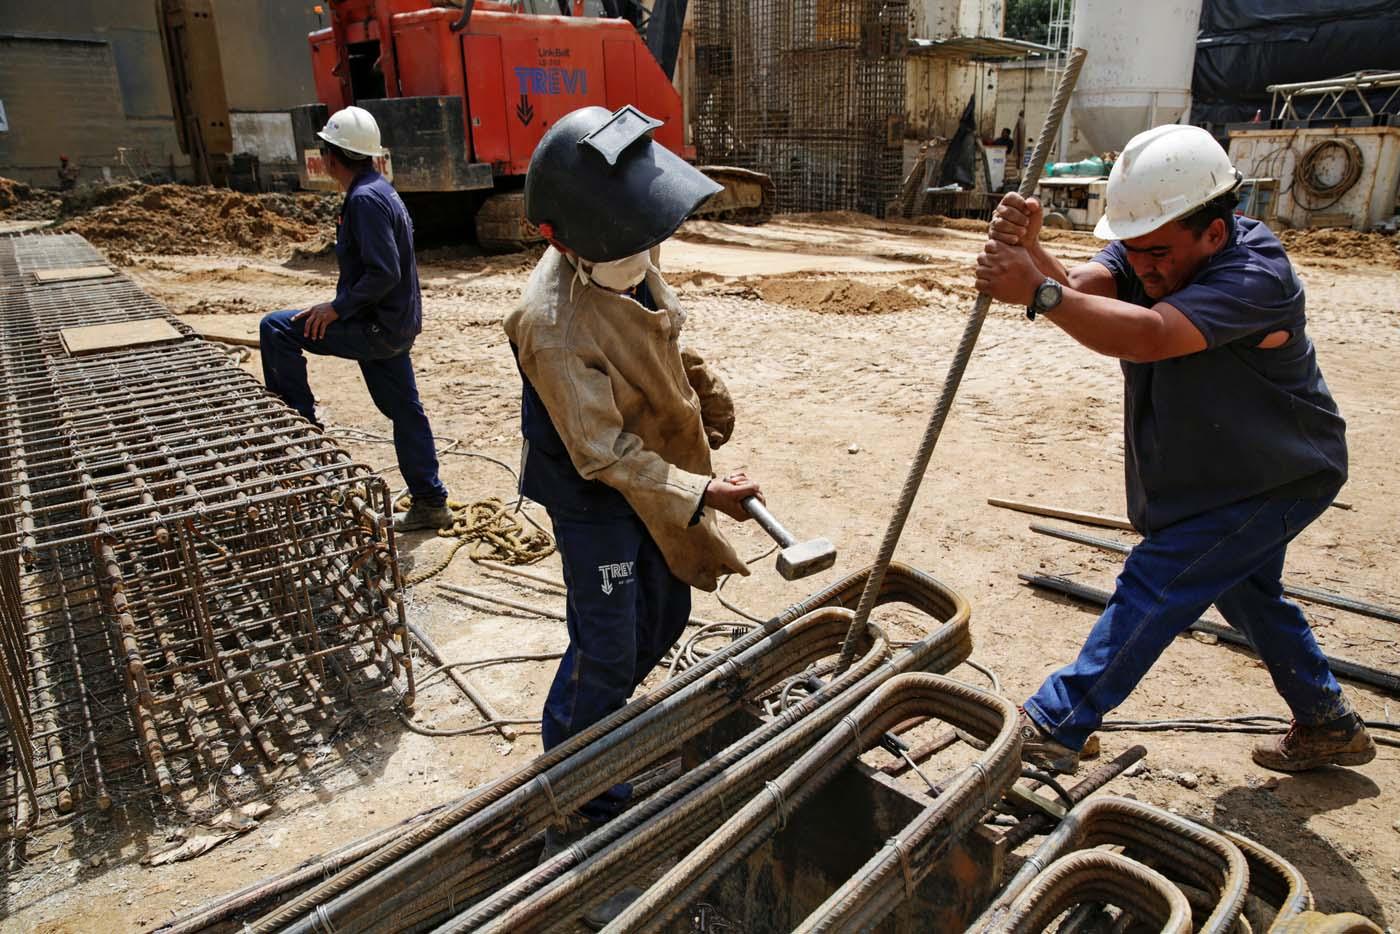 2016-10-07T114923Z_1479035300_D1AEUFPCRZAA_RTRMADP_3_VENEZUELA-CONSTRUCTION